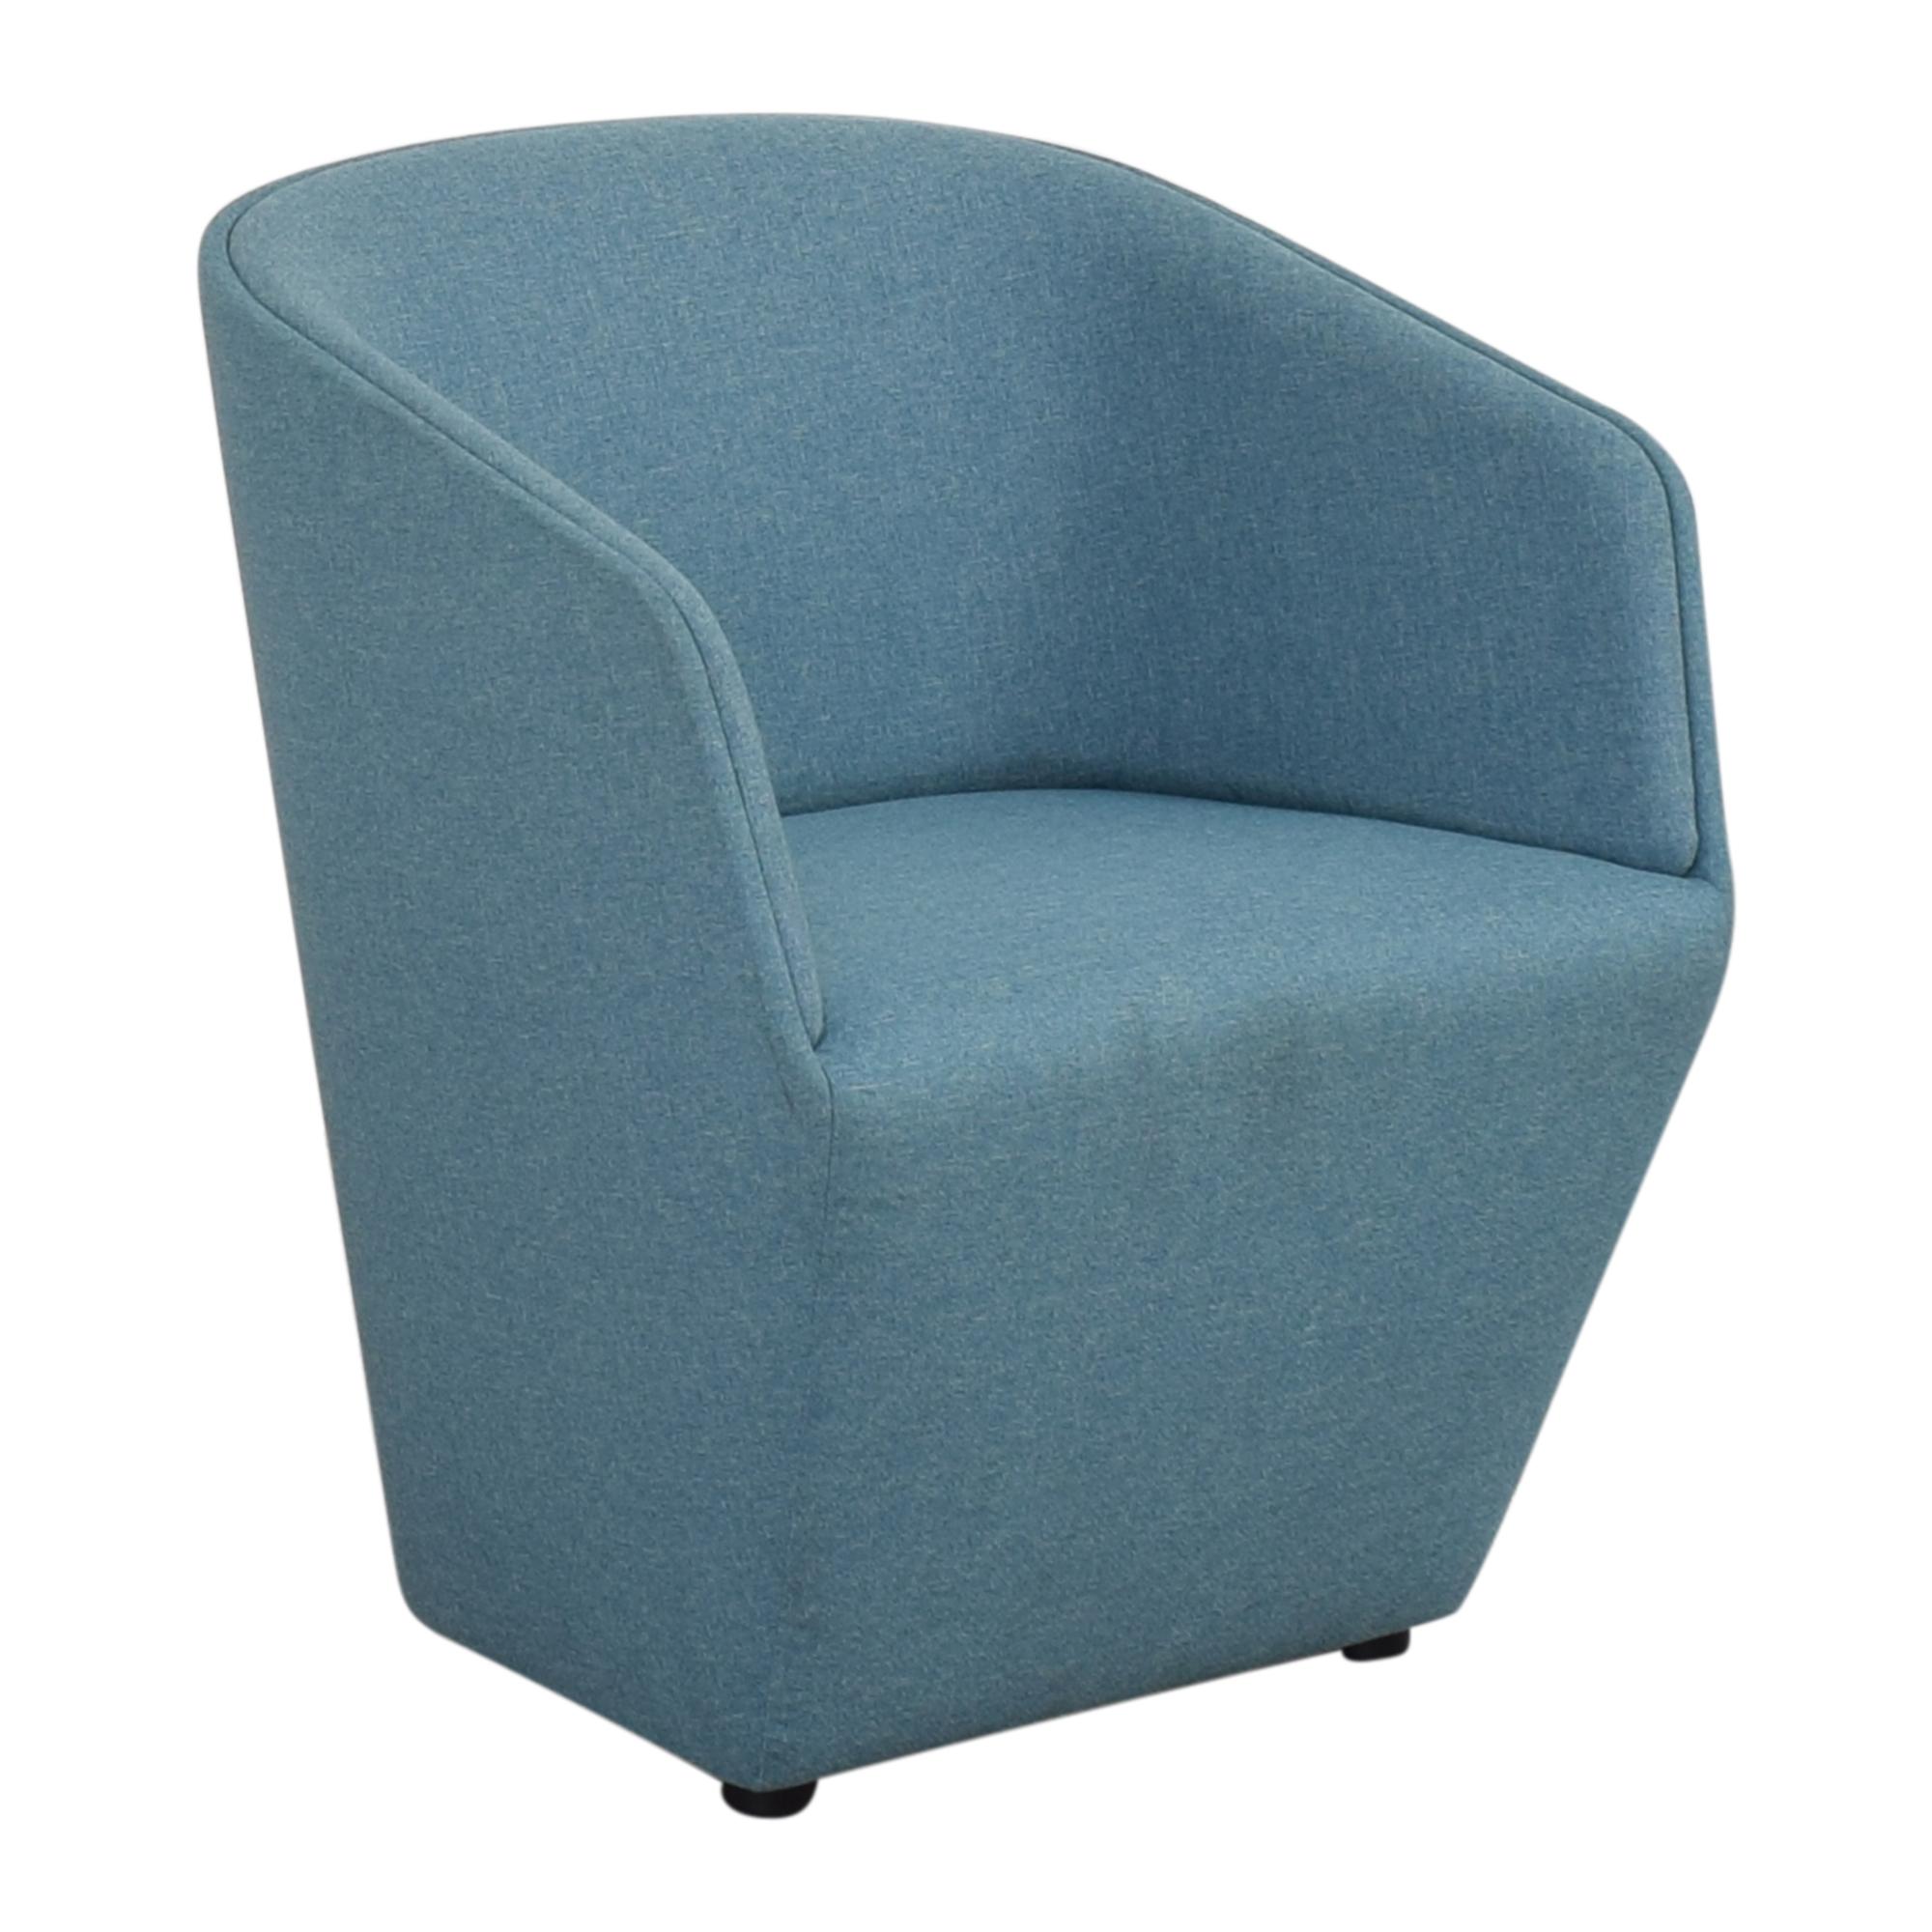 Poppin Poppin Pitch Club Chair nj